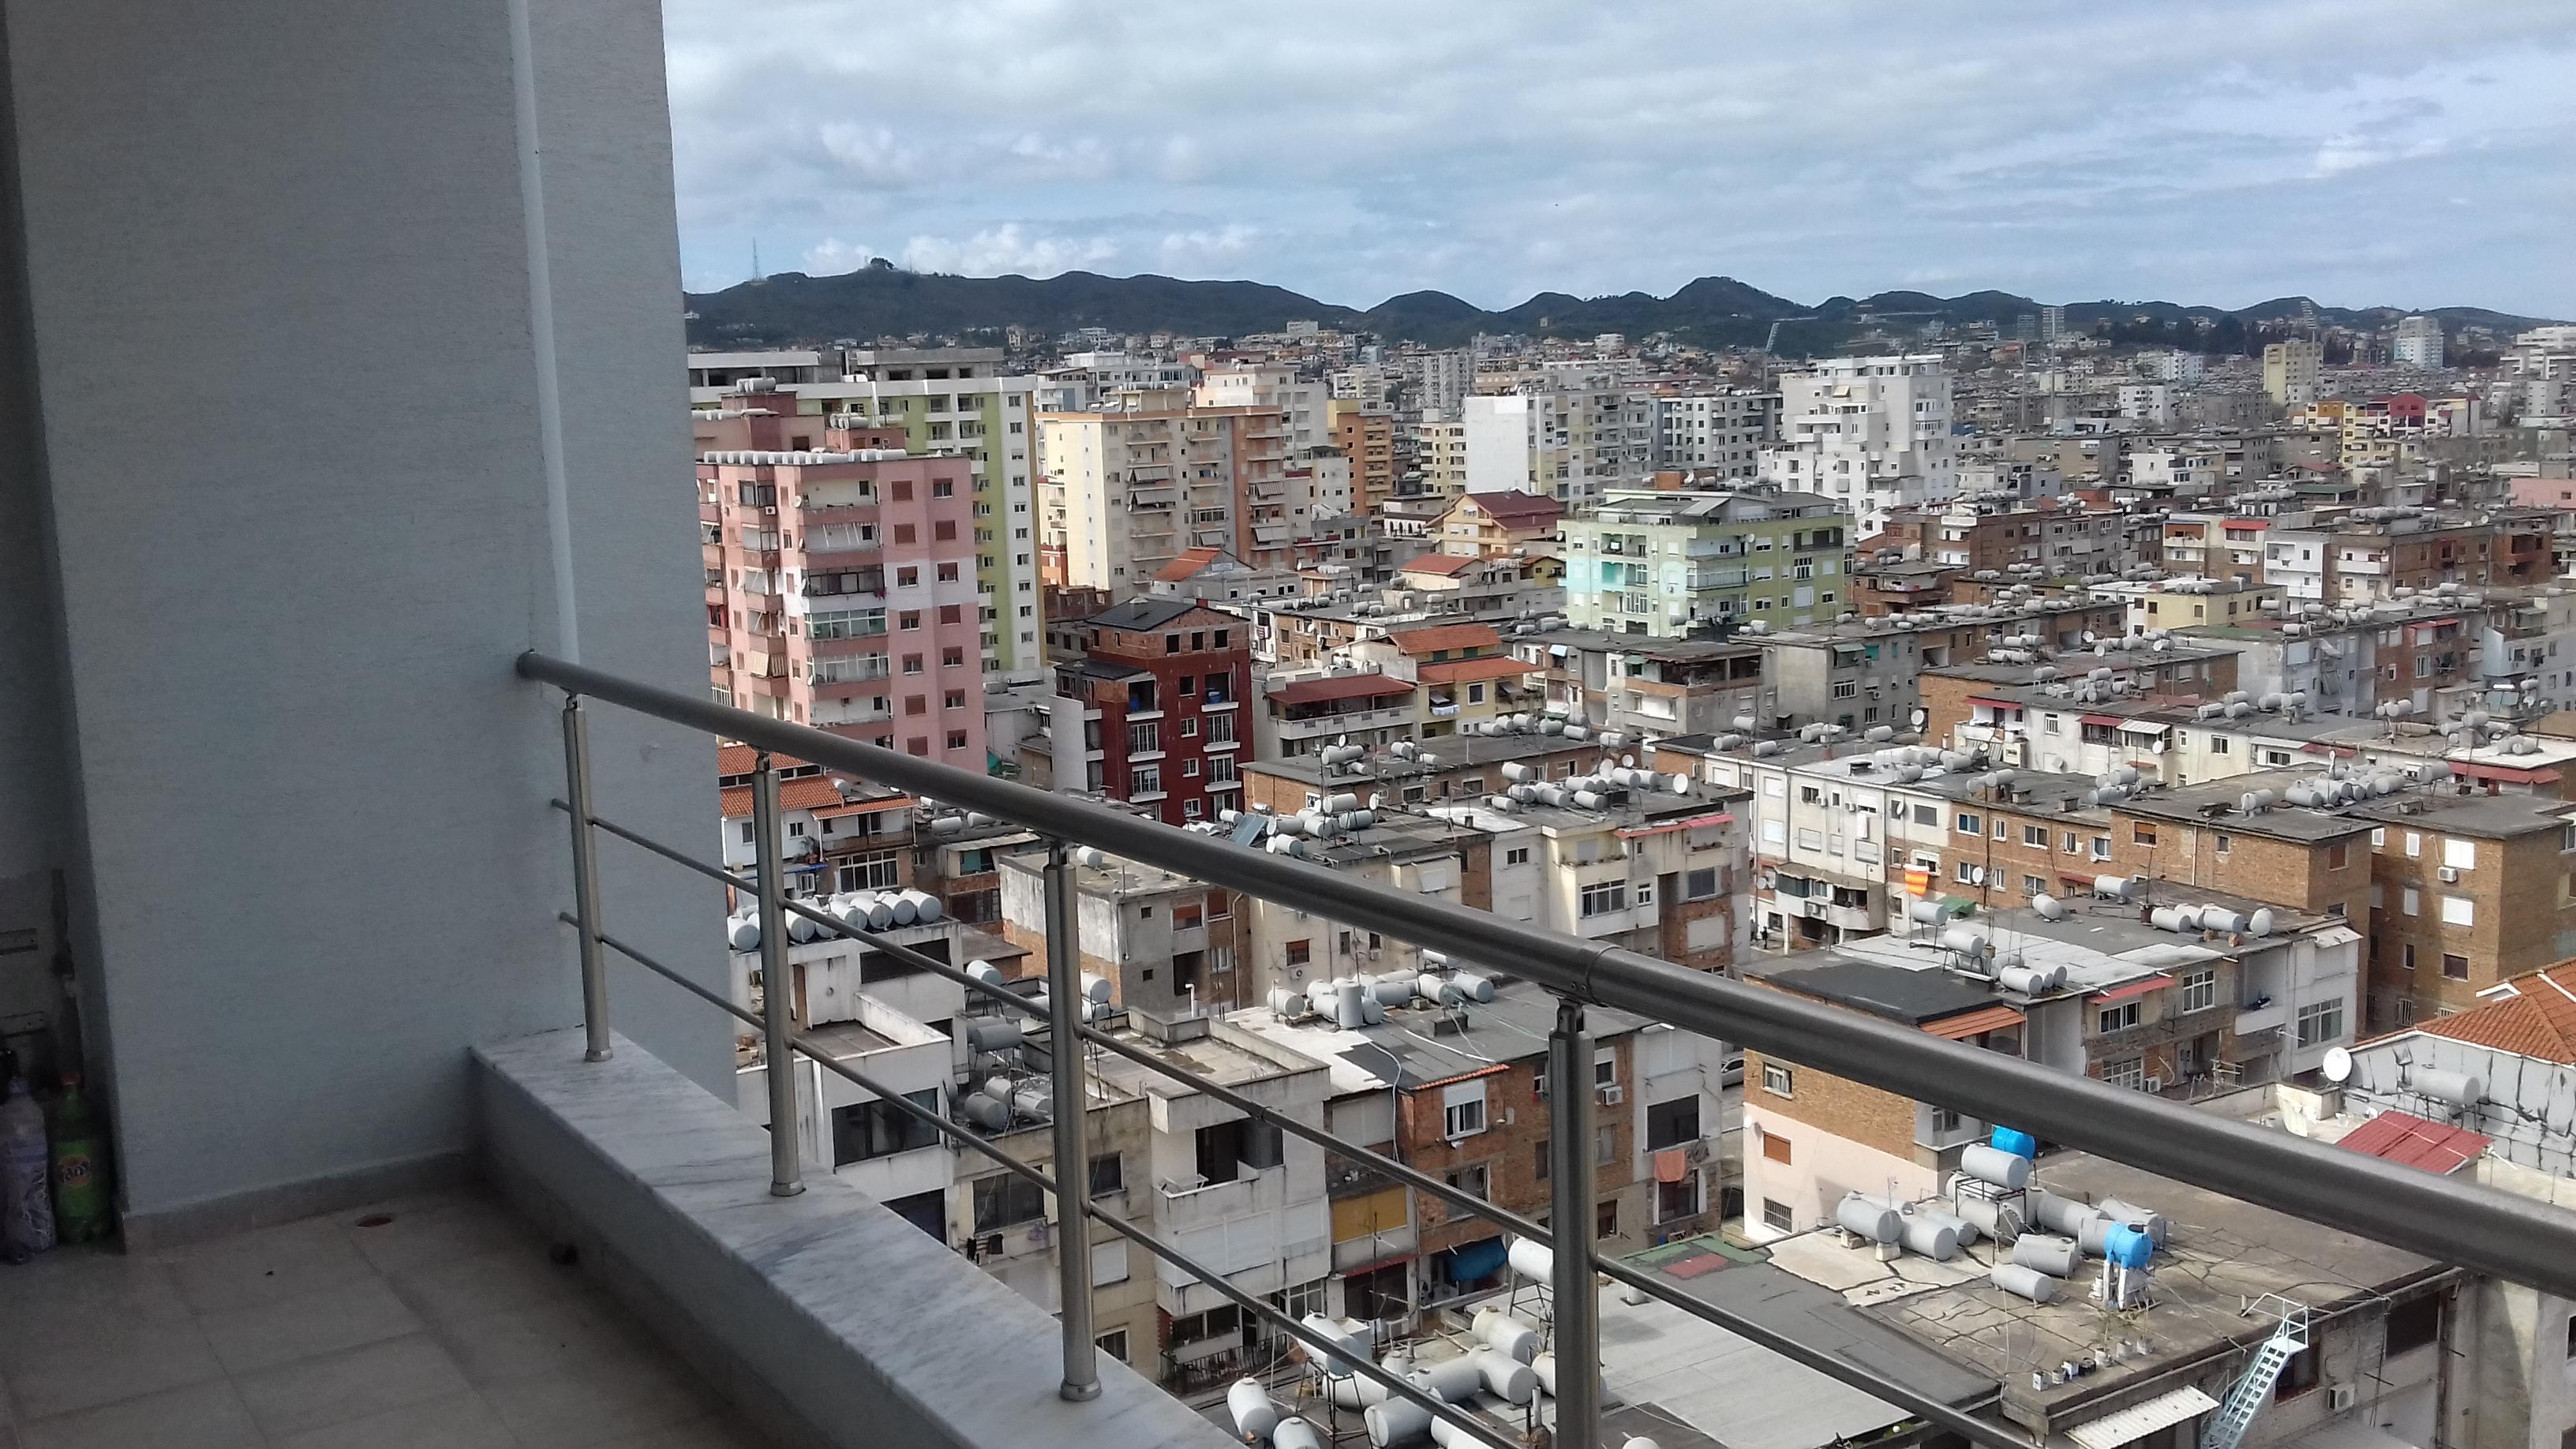 Super Apartamenti sistem ngrohje qendrore cilesi pallat i ri punime cilesore,Ku do Soditni pamjen Piktoreske nga Veranda